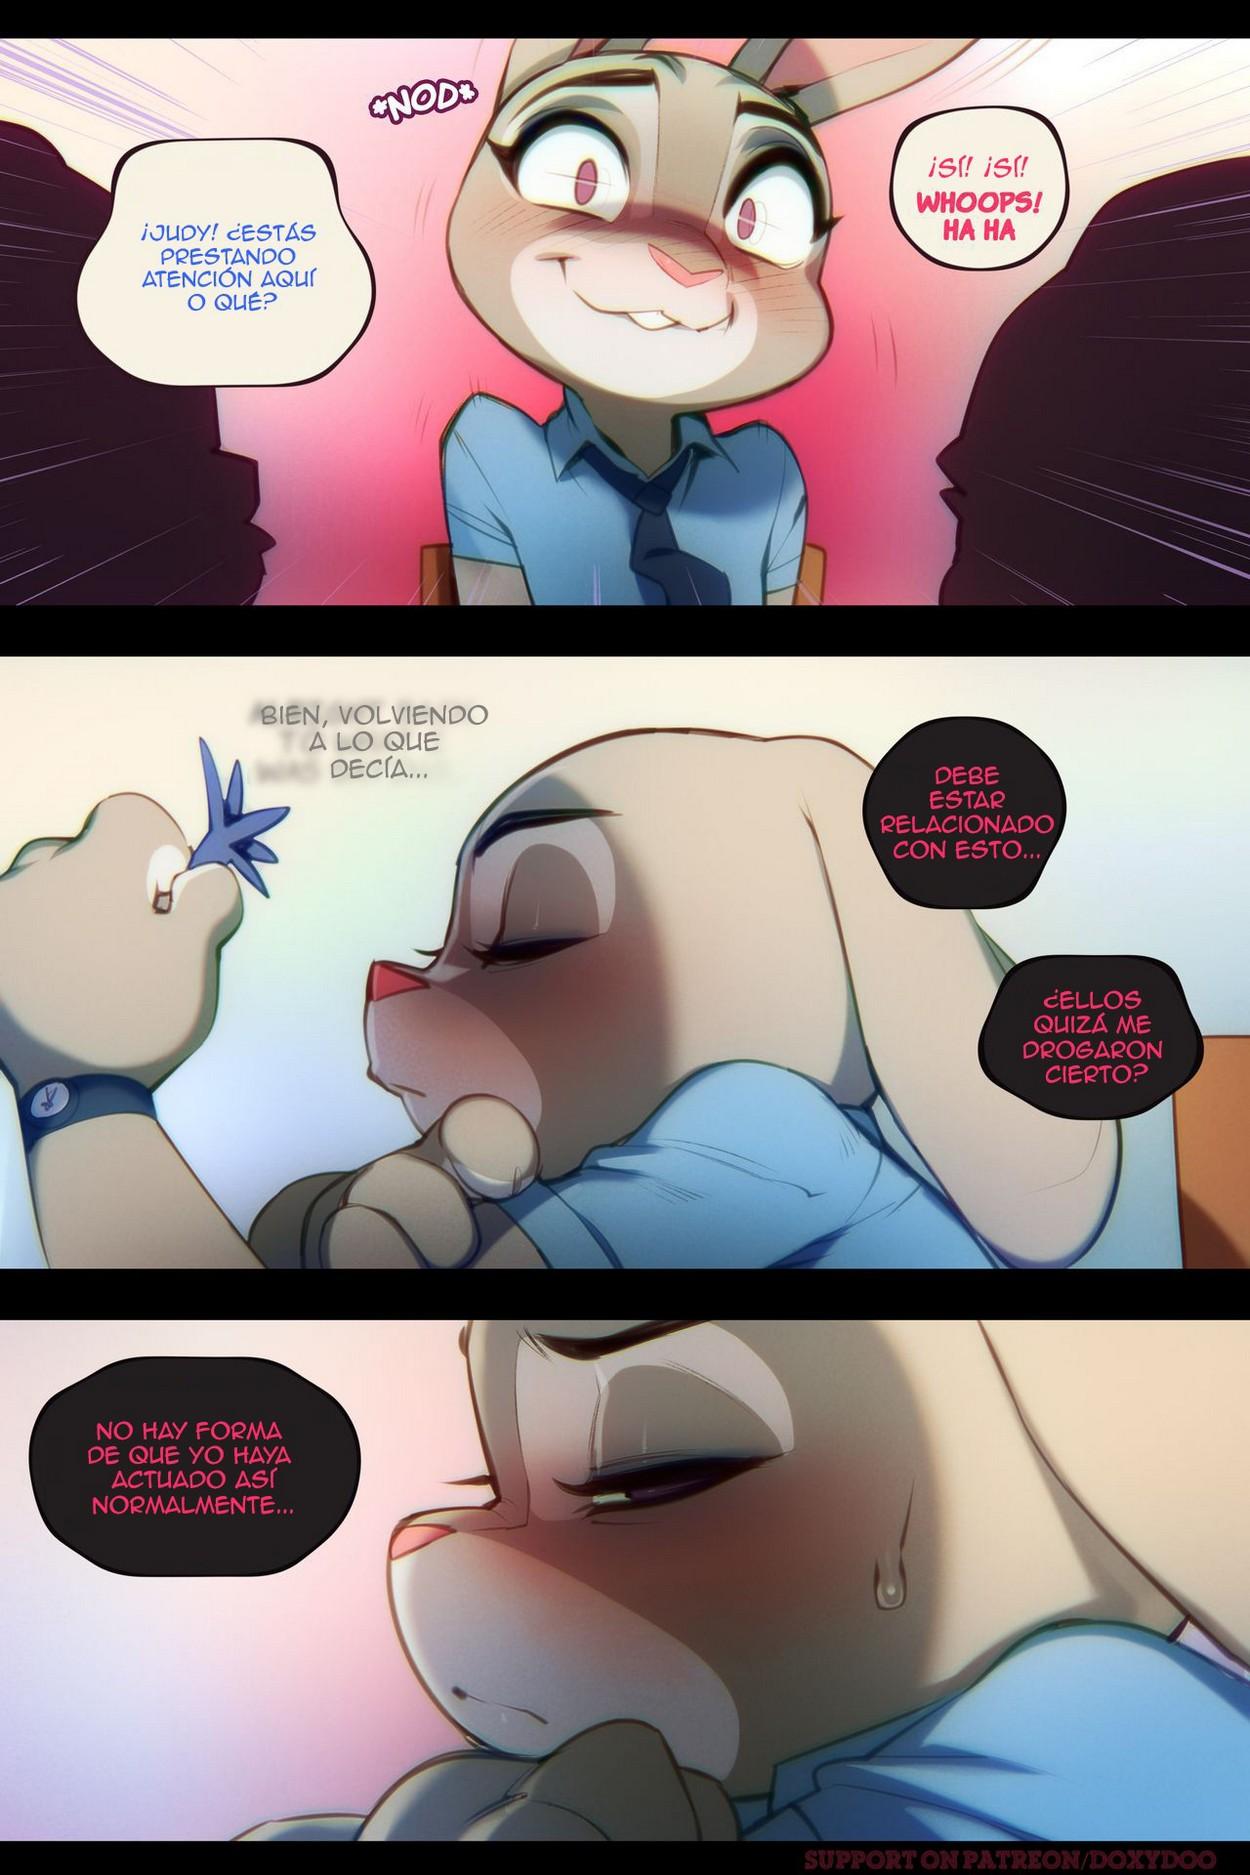 Rosa Phat Pussy